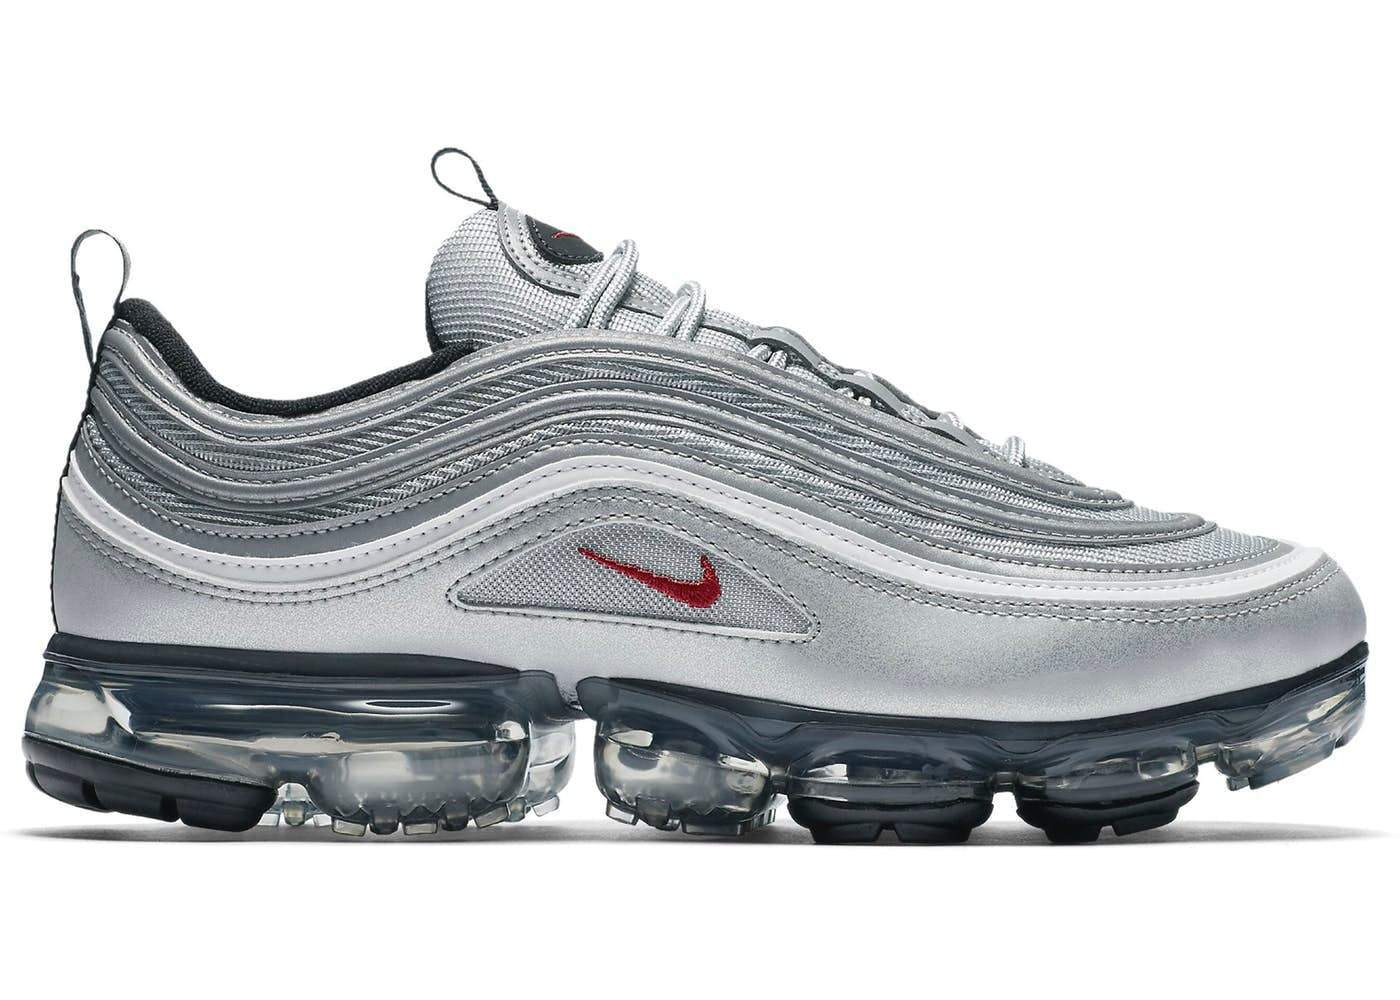 6f536178b3 Nike Air VaporMax 97 Silver Bullet | AJ7291-002 - True Looks